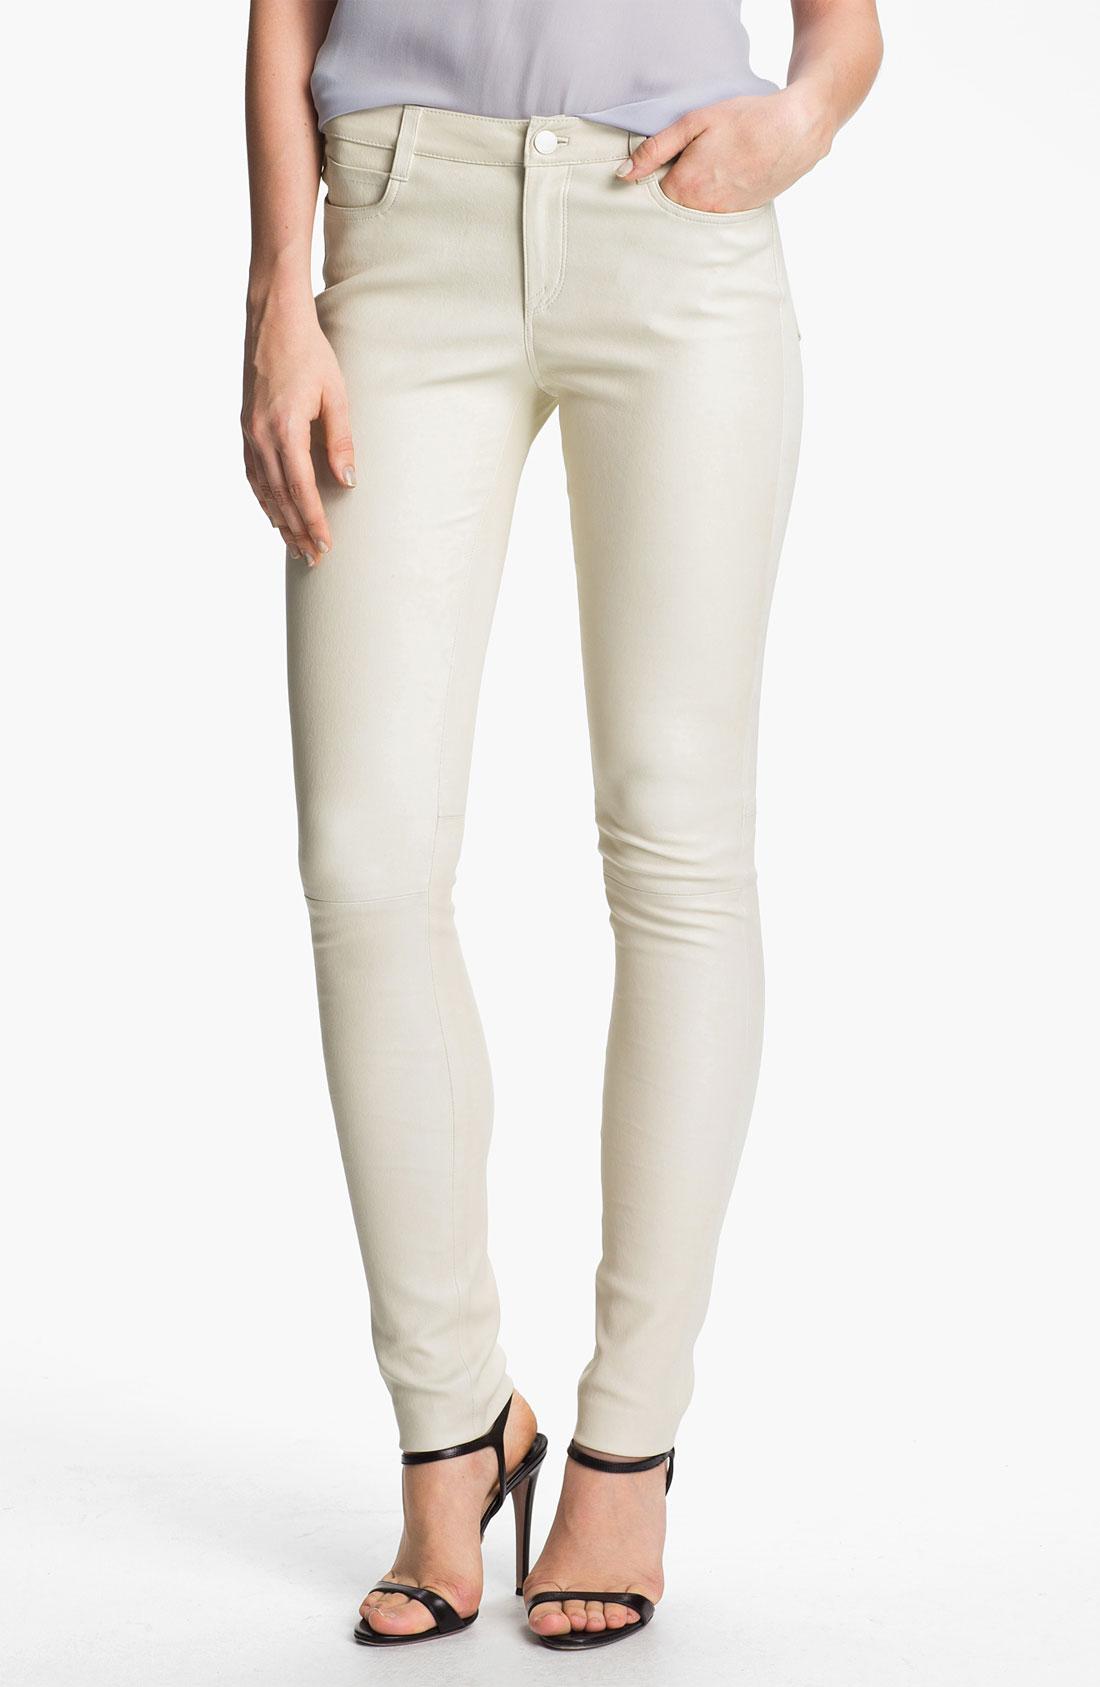 Designer Mens Skinny Jeans